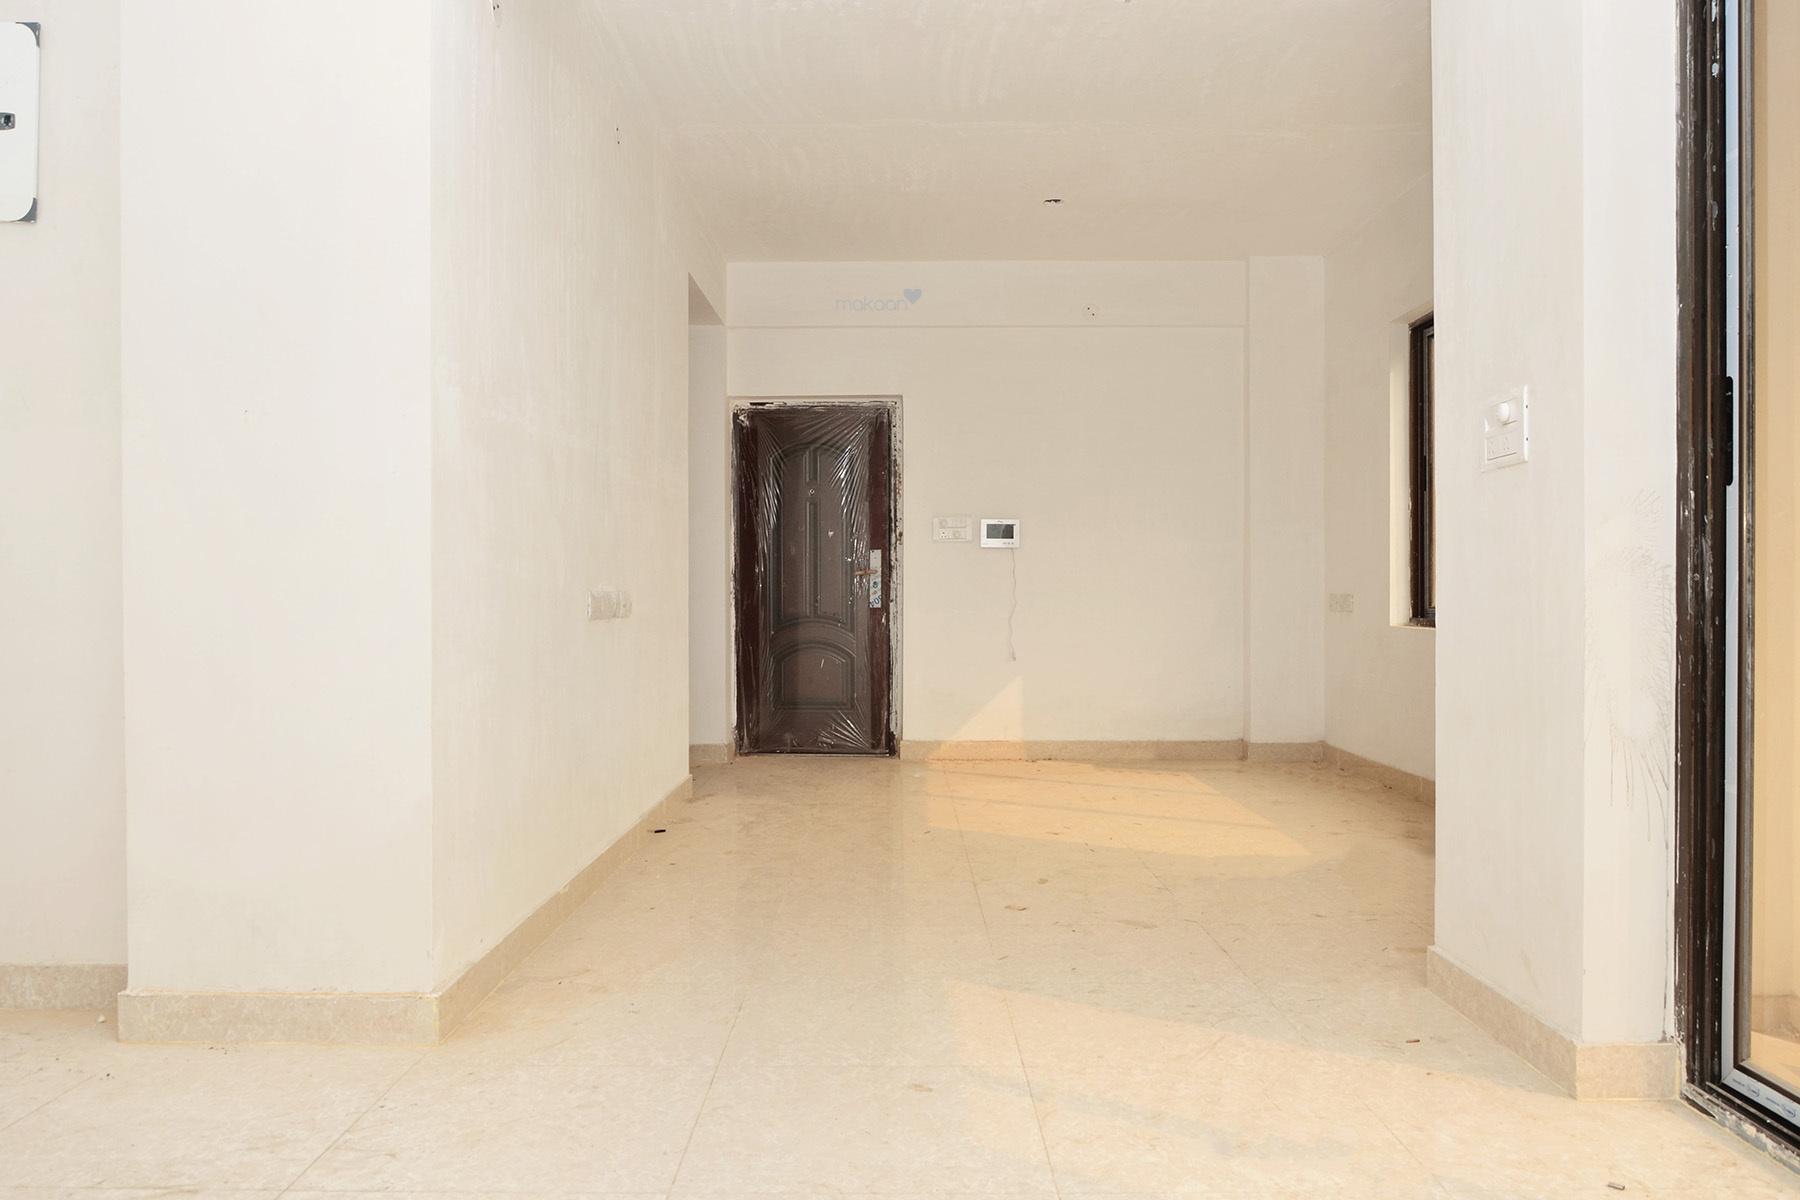 2074 sq ft 3BHK 3BHK+3T (2,074 sq ft)   Study Room Property By Proptiger In Avidipta, Mukundapur